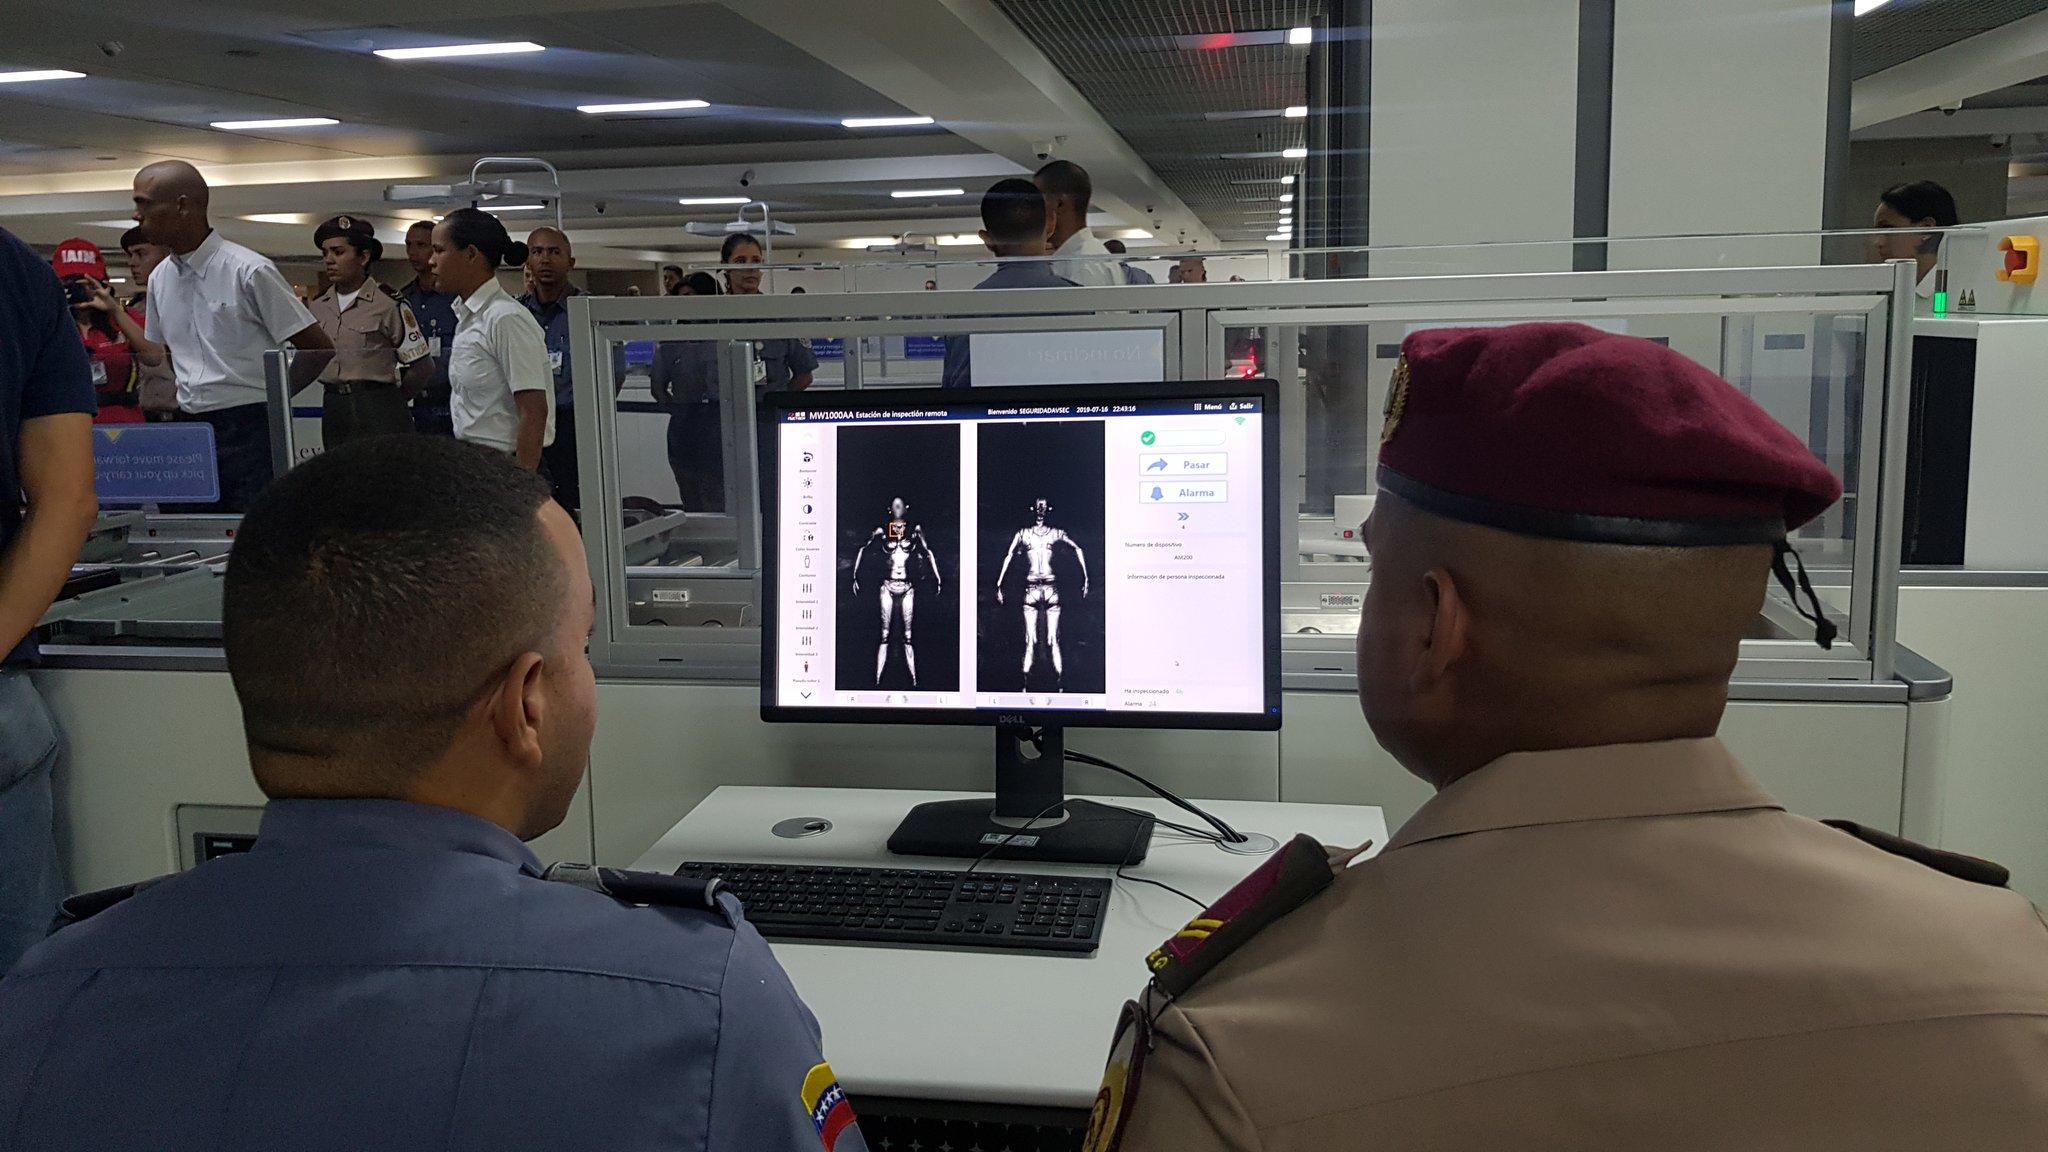 Venezuela: Modernizan equipos de seguridad en Aeropuerto Internacional Simón Bolívar